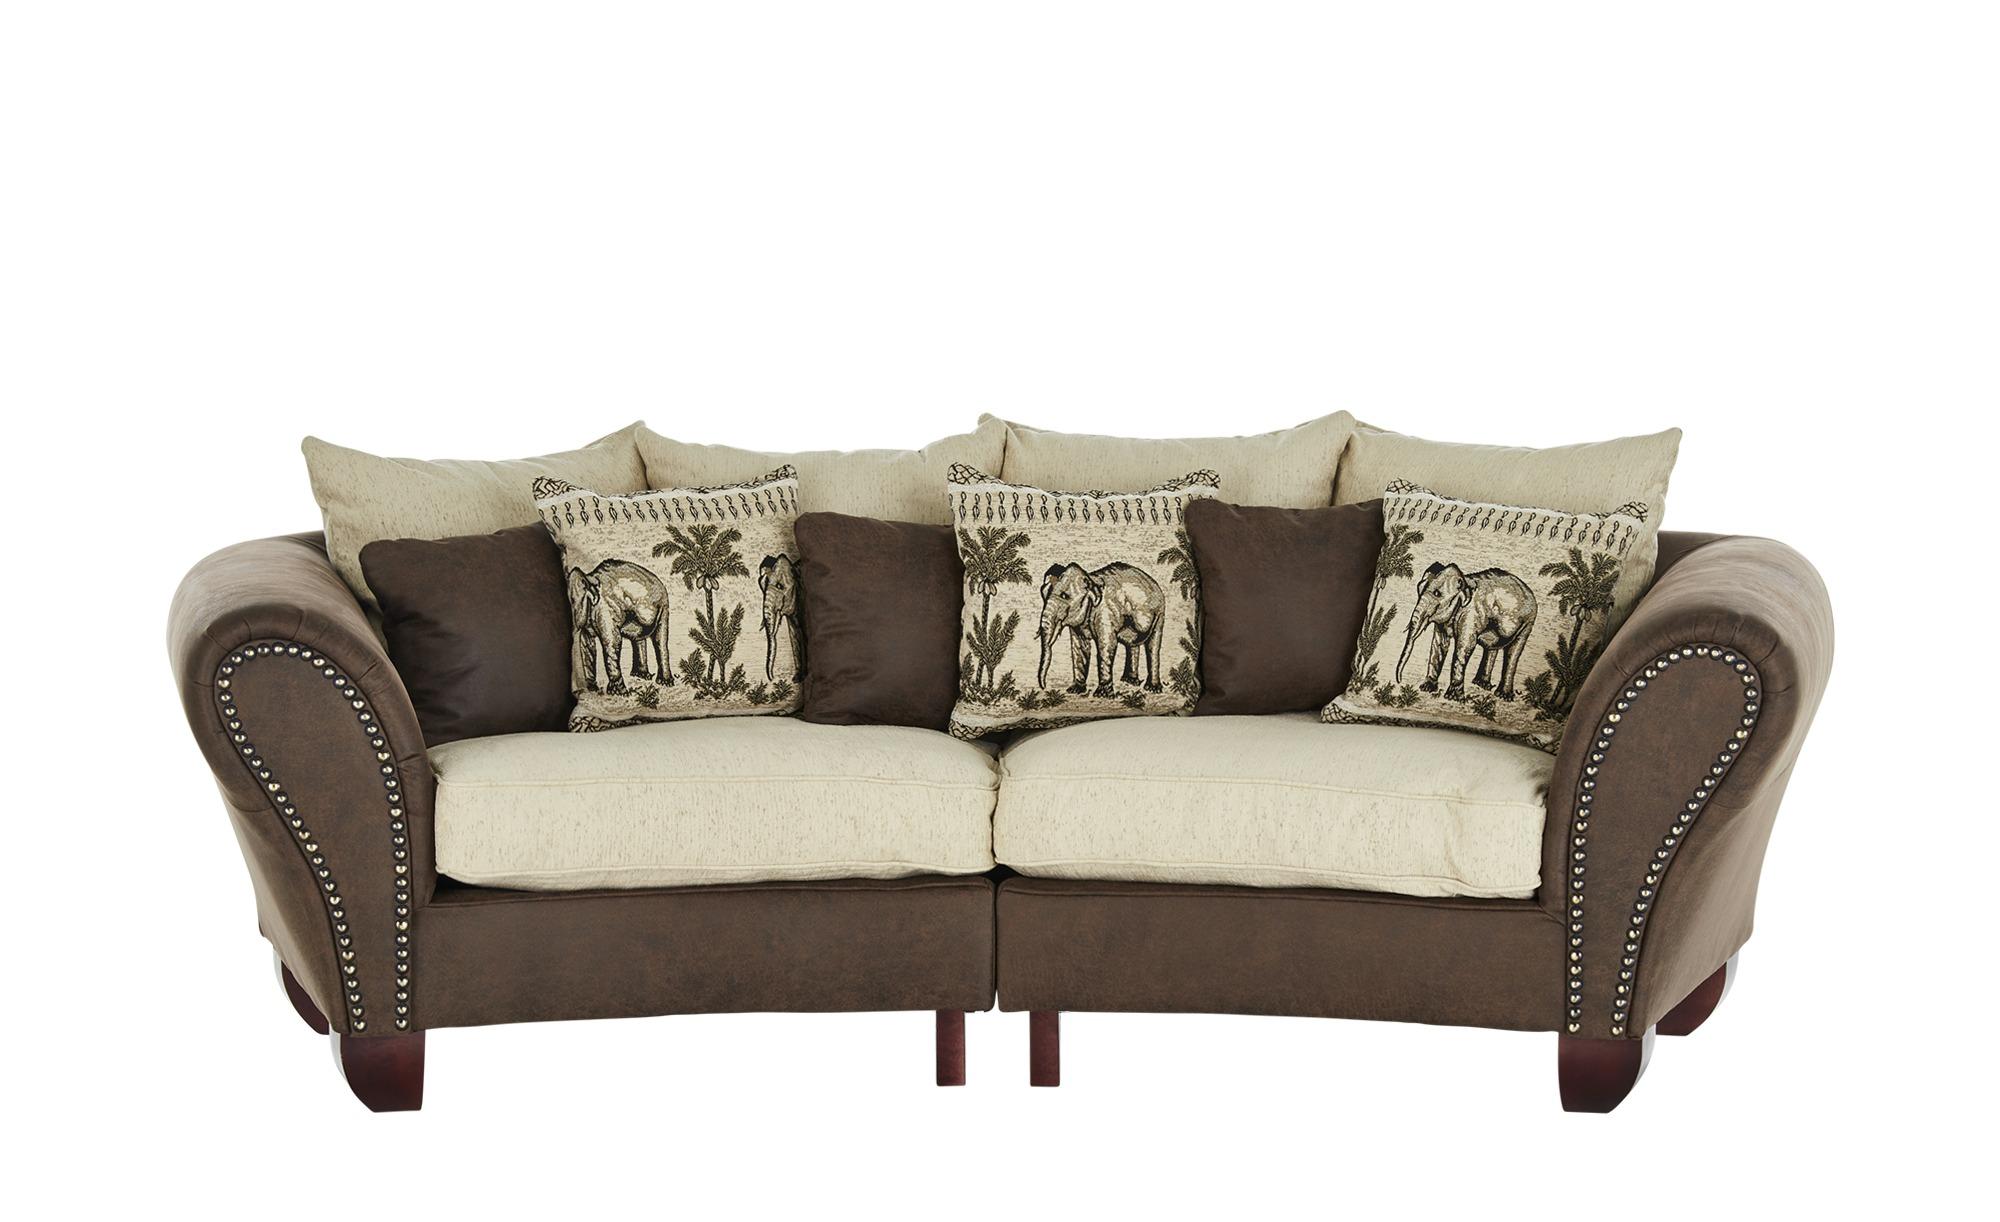 smart Big Sofa  Nadja ¦ braun ¦ Maße (cm): B: 277 H: 100 T: 108 Polstermöbel > Sofas > 3-Sitzer - Höffner